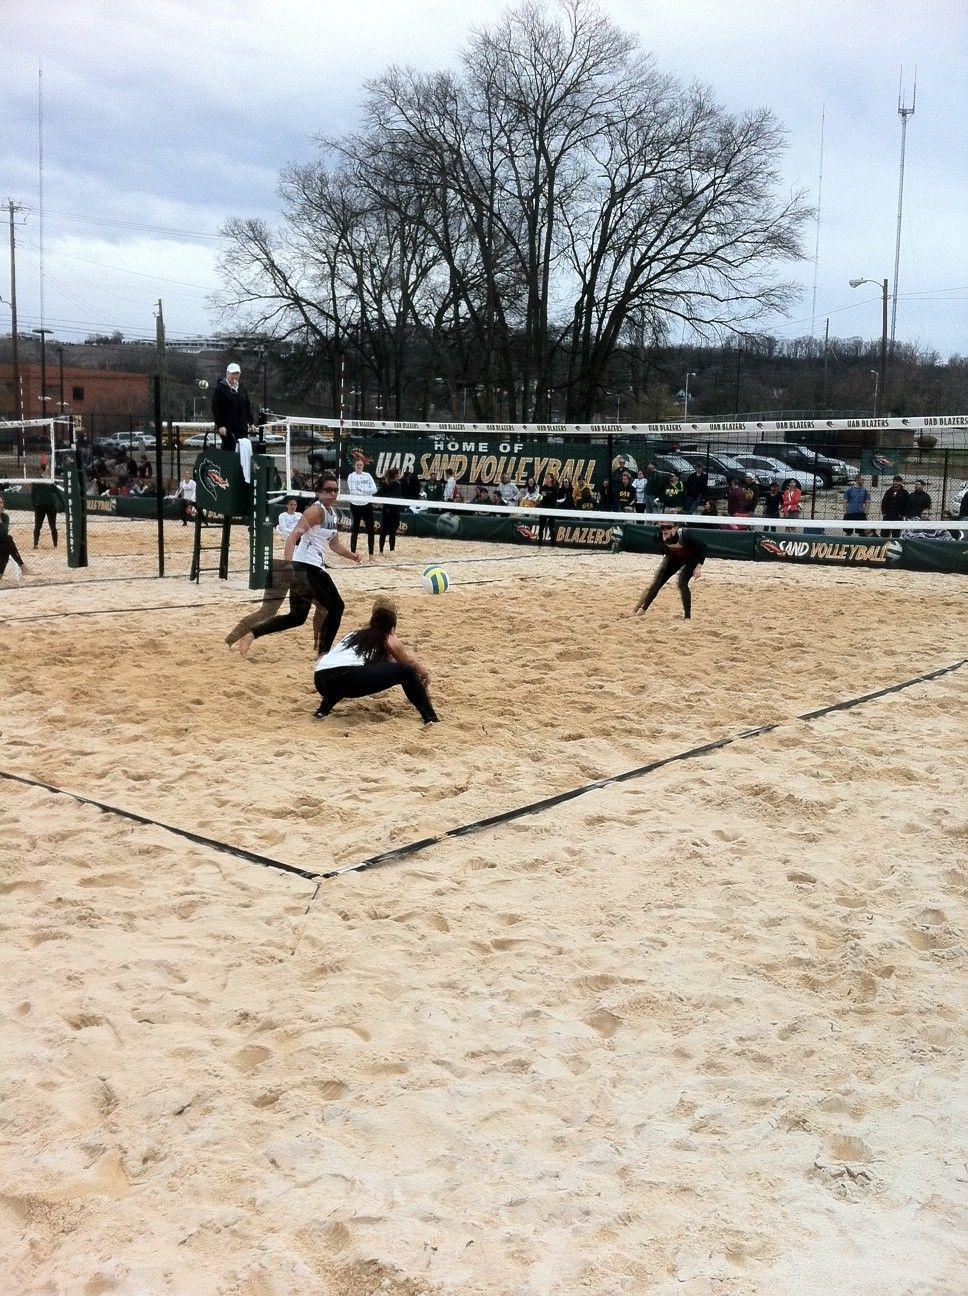 Sand Volleyball Match Fsu Vs Uab Beach Volleyball Volleyball Soccer Field